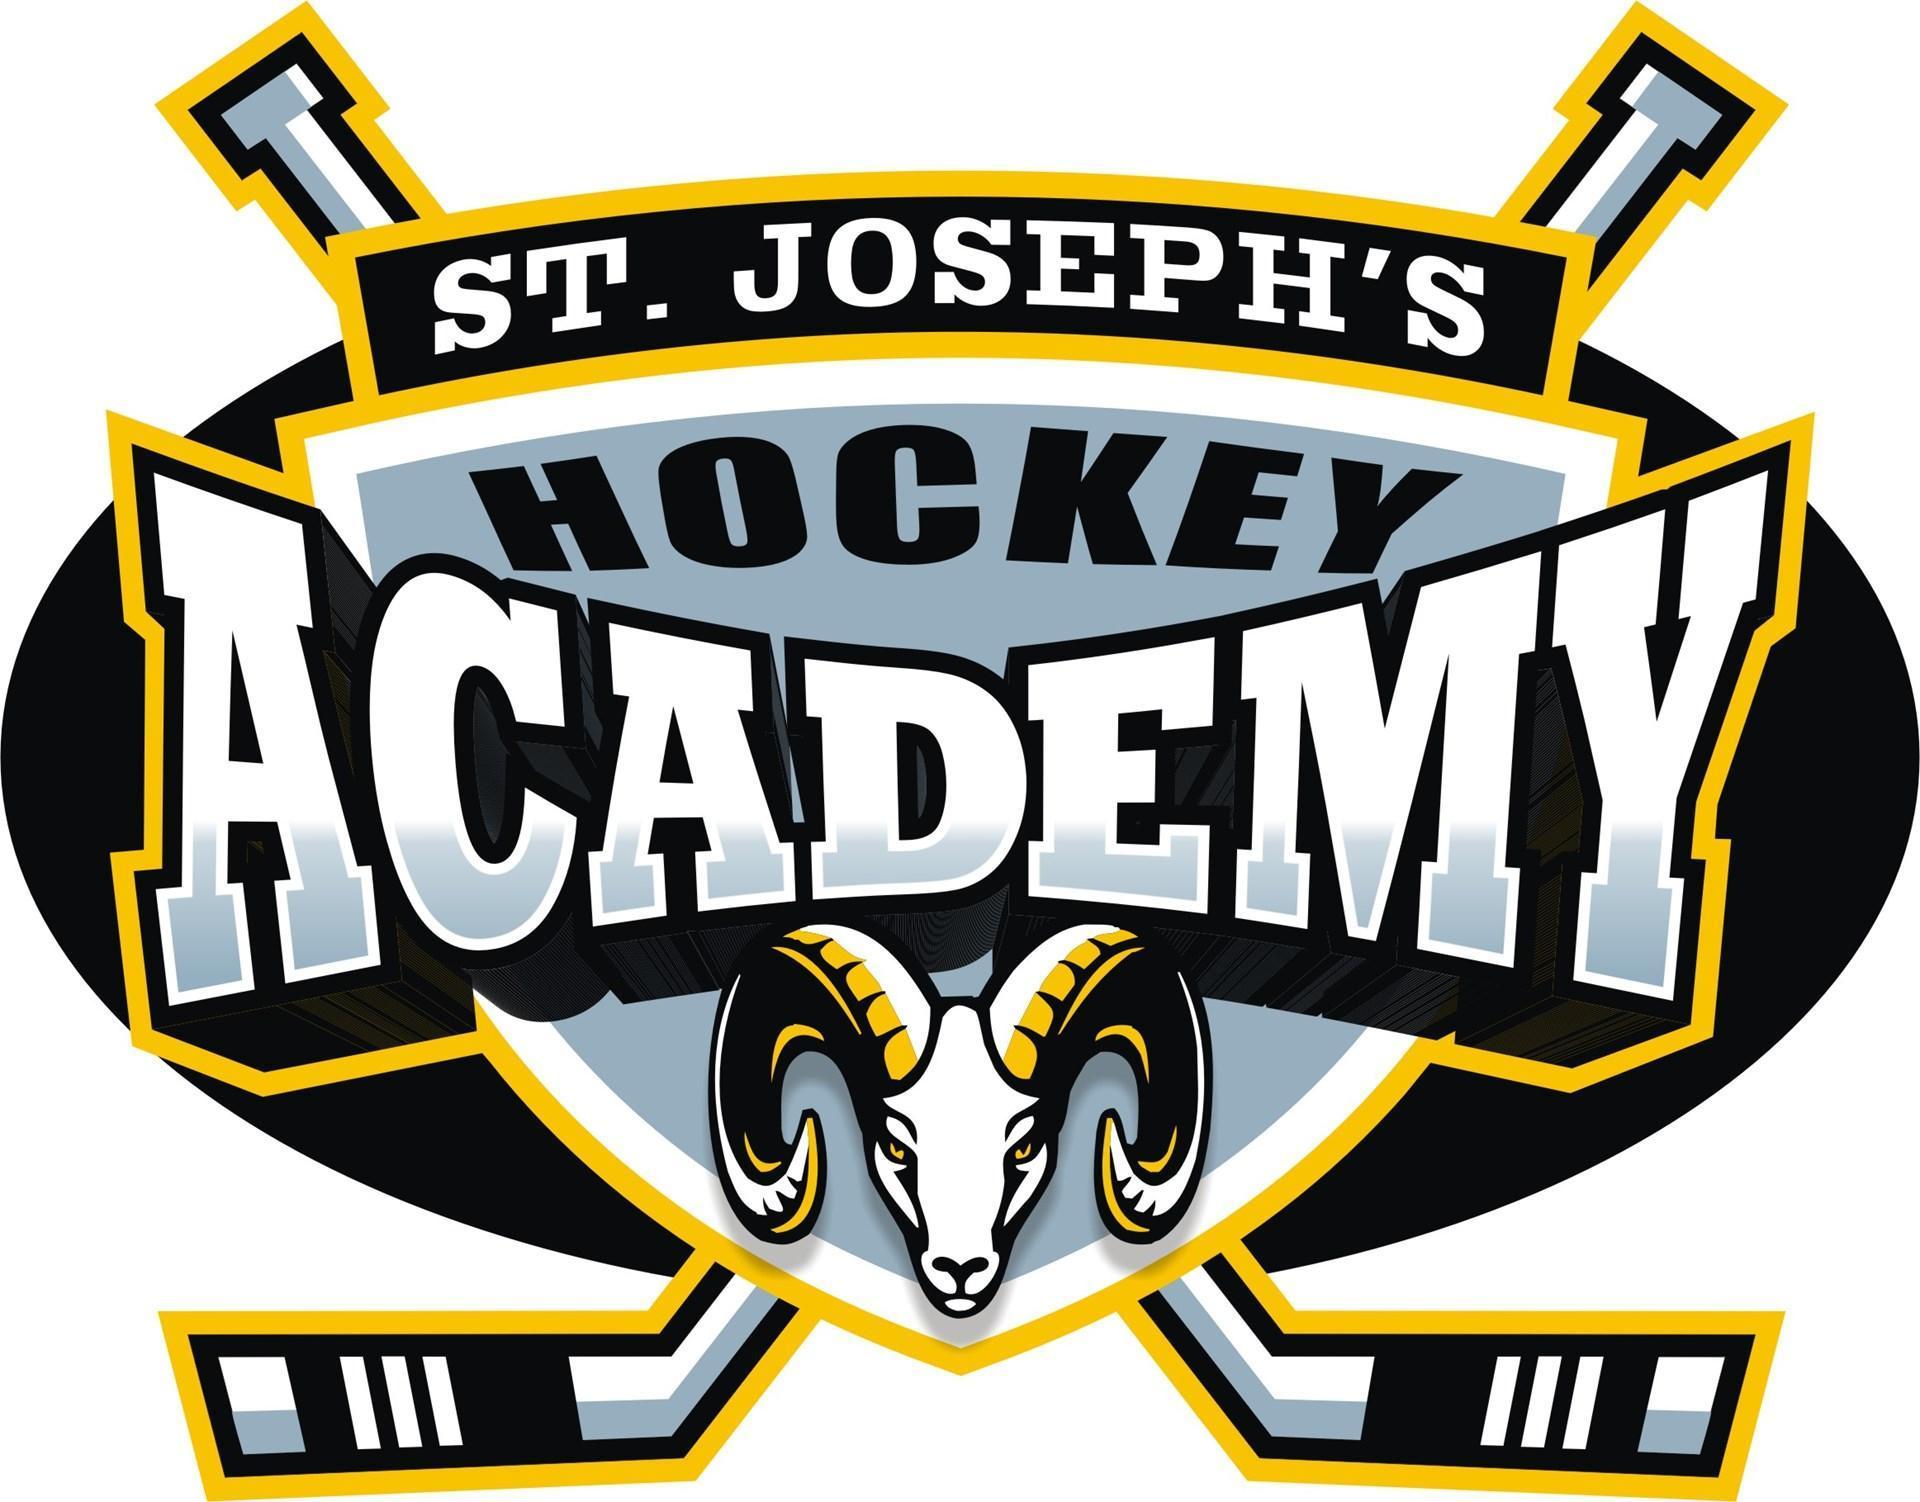 St. Joseph's Hockey Academy